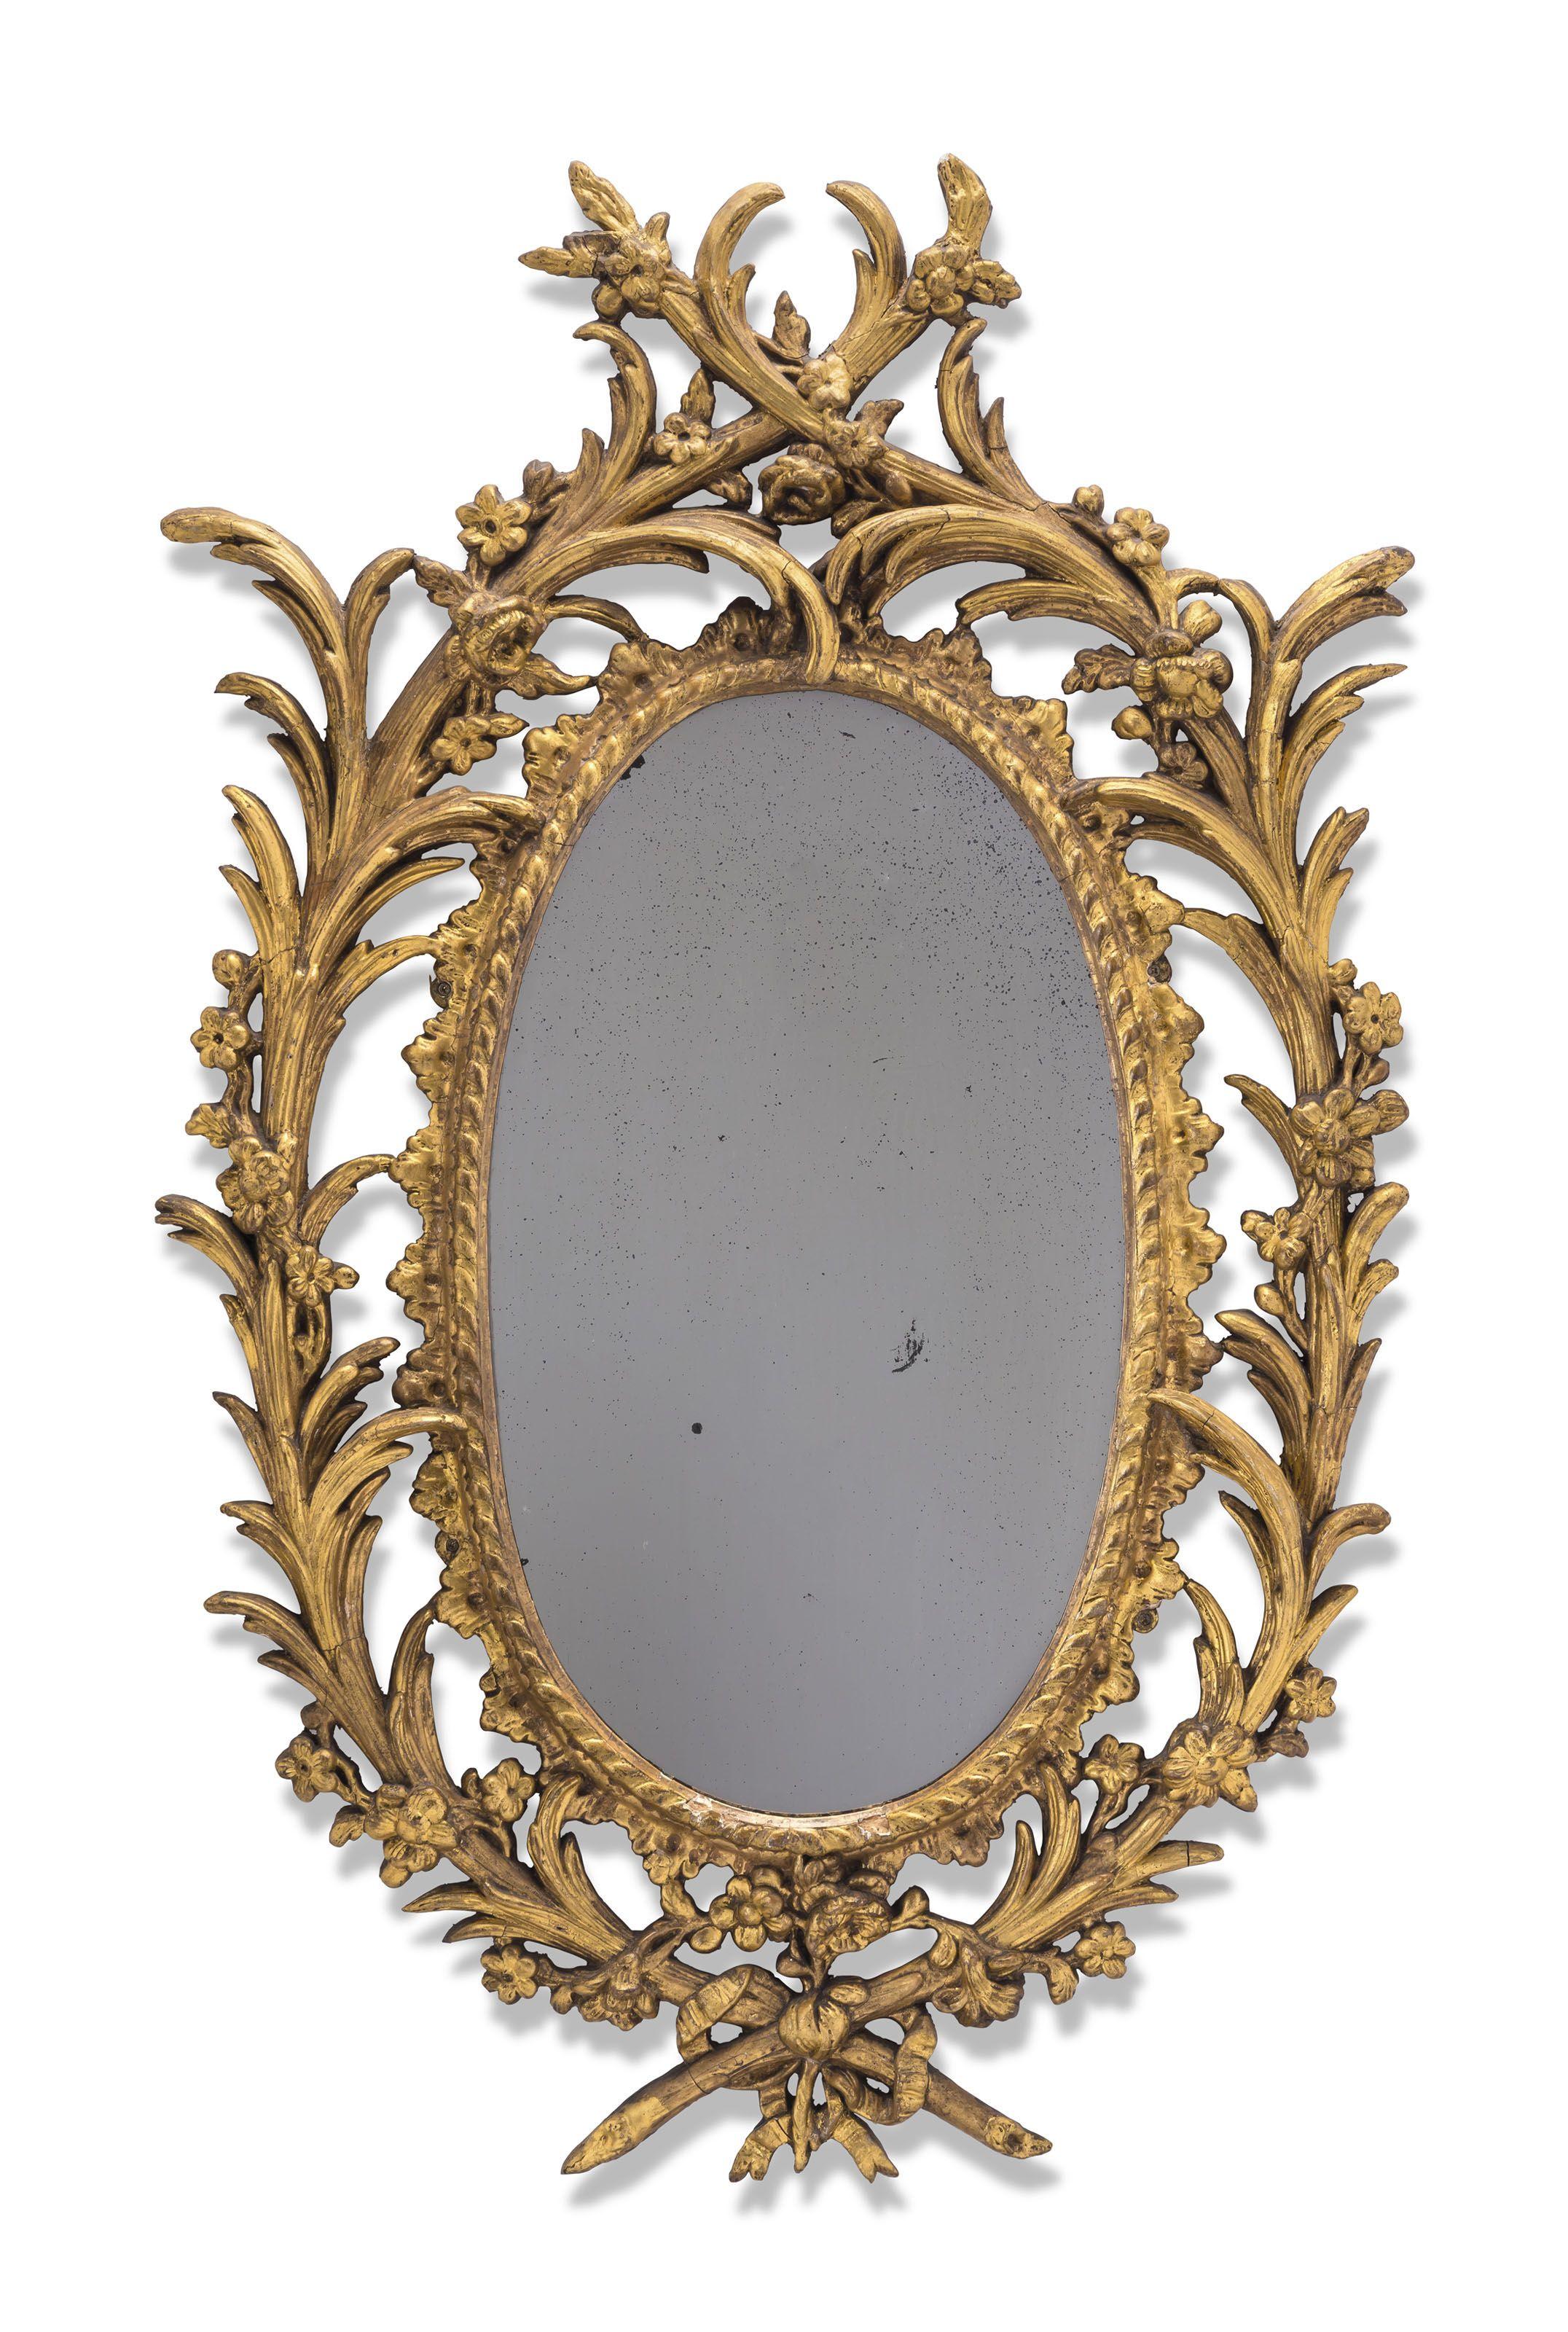 C1760 70 A George Iii Carton Pierre Oval Wall Mirror Circa 1760 70 Price Realised Gbp 4 000 Oval Wall Mirror Mirror Wall Mirror